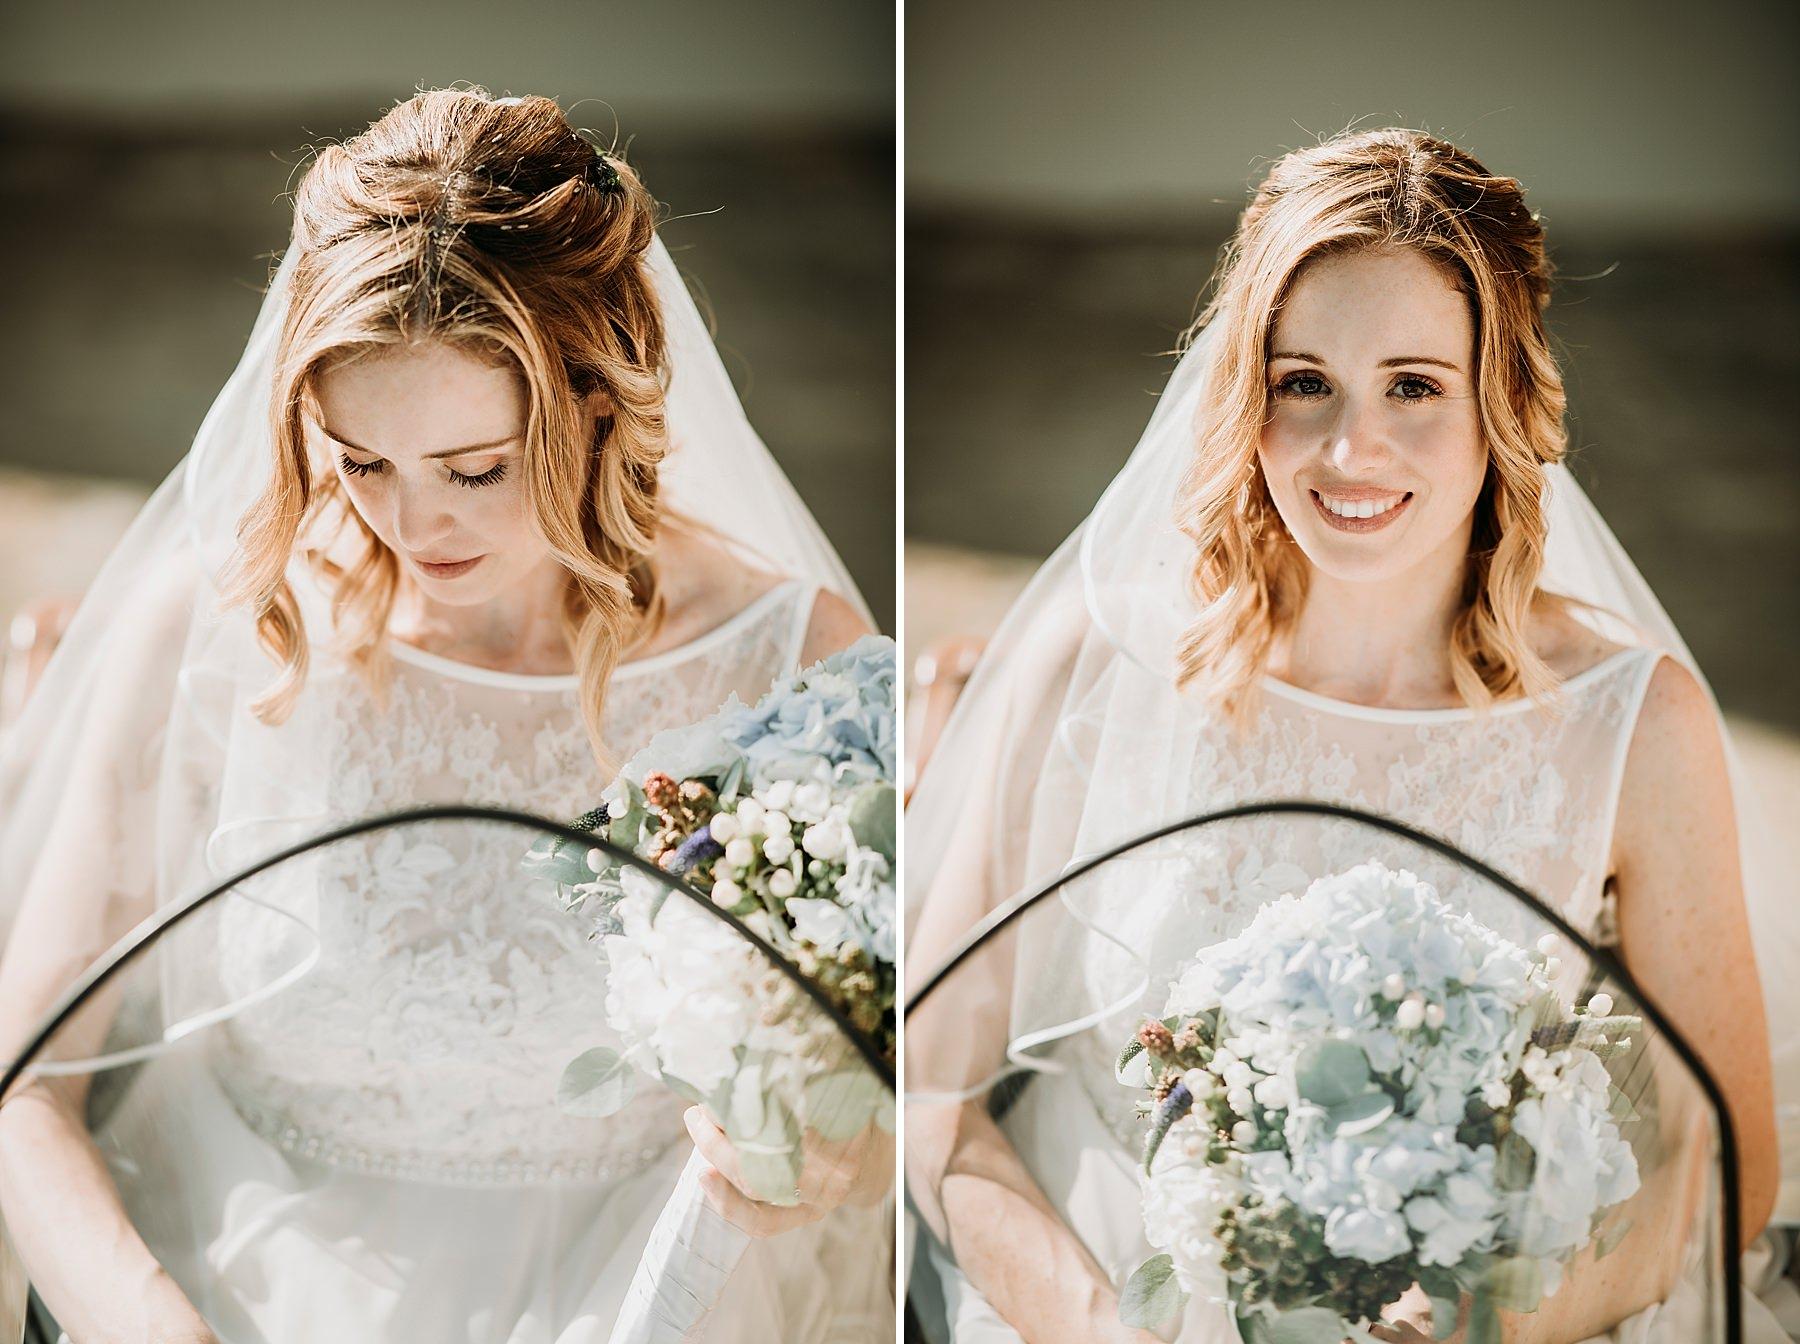 Matrimonio nel Chianti Impruneta Firenze vespa 50